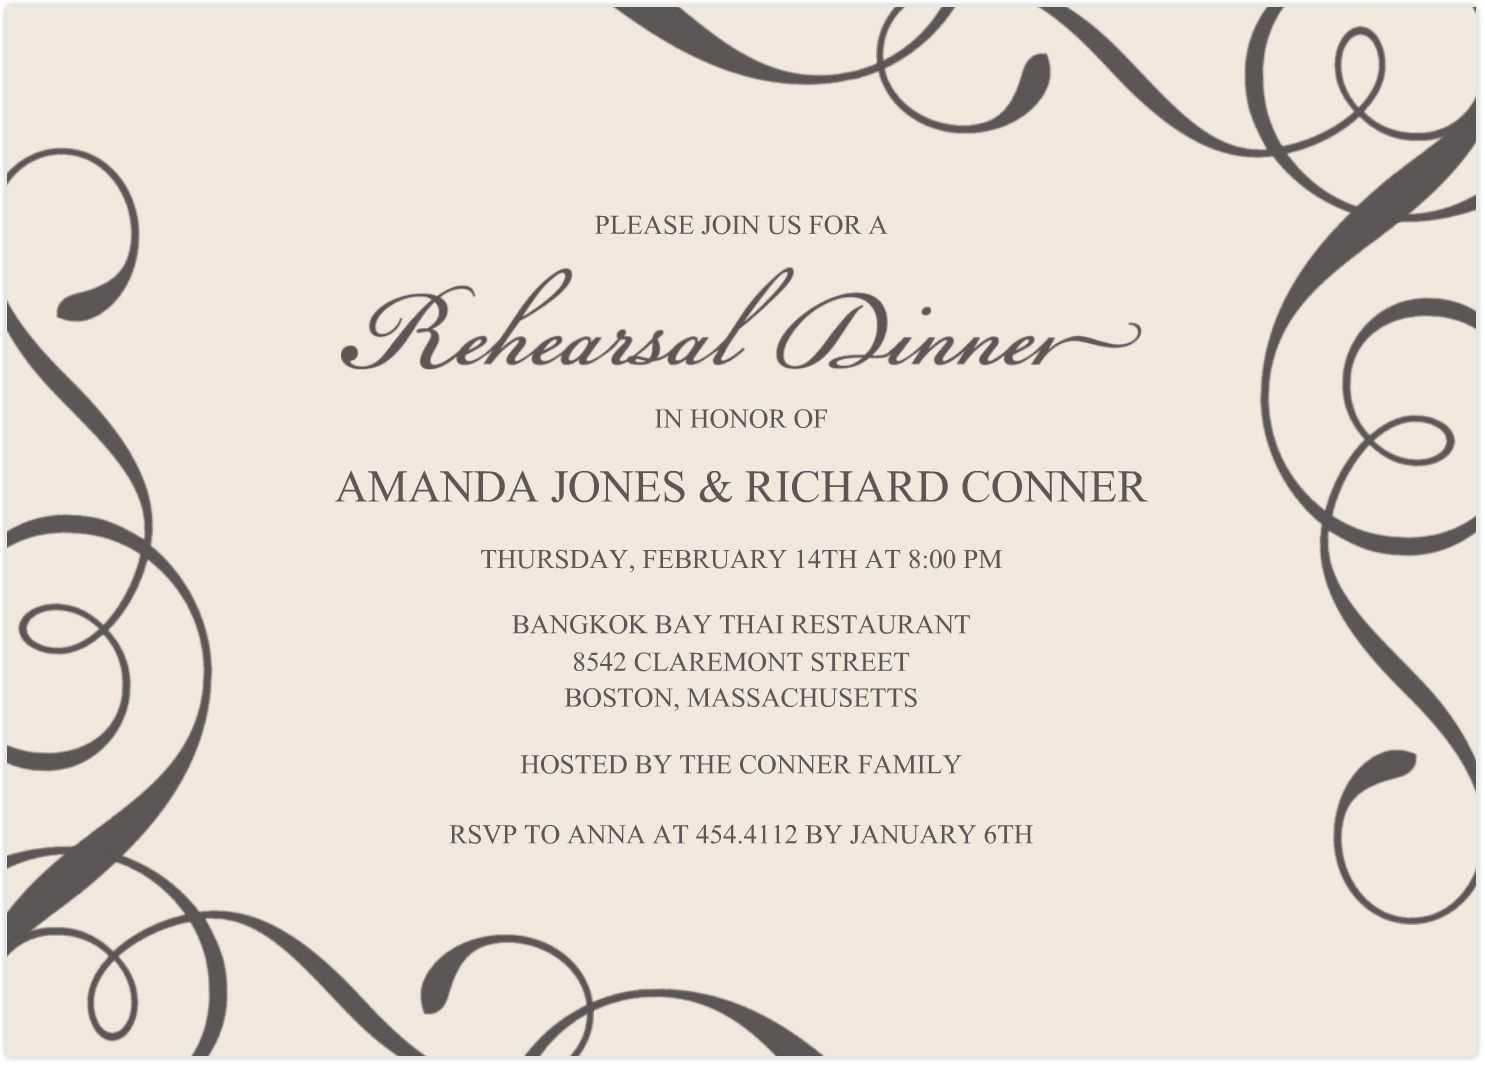 Free Invitation Templates Word - Karati.ald2014 For Free Dinner Invitation Templates For Word